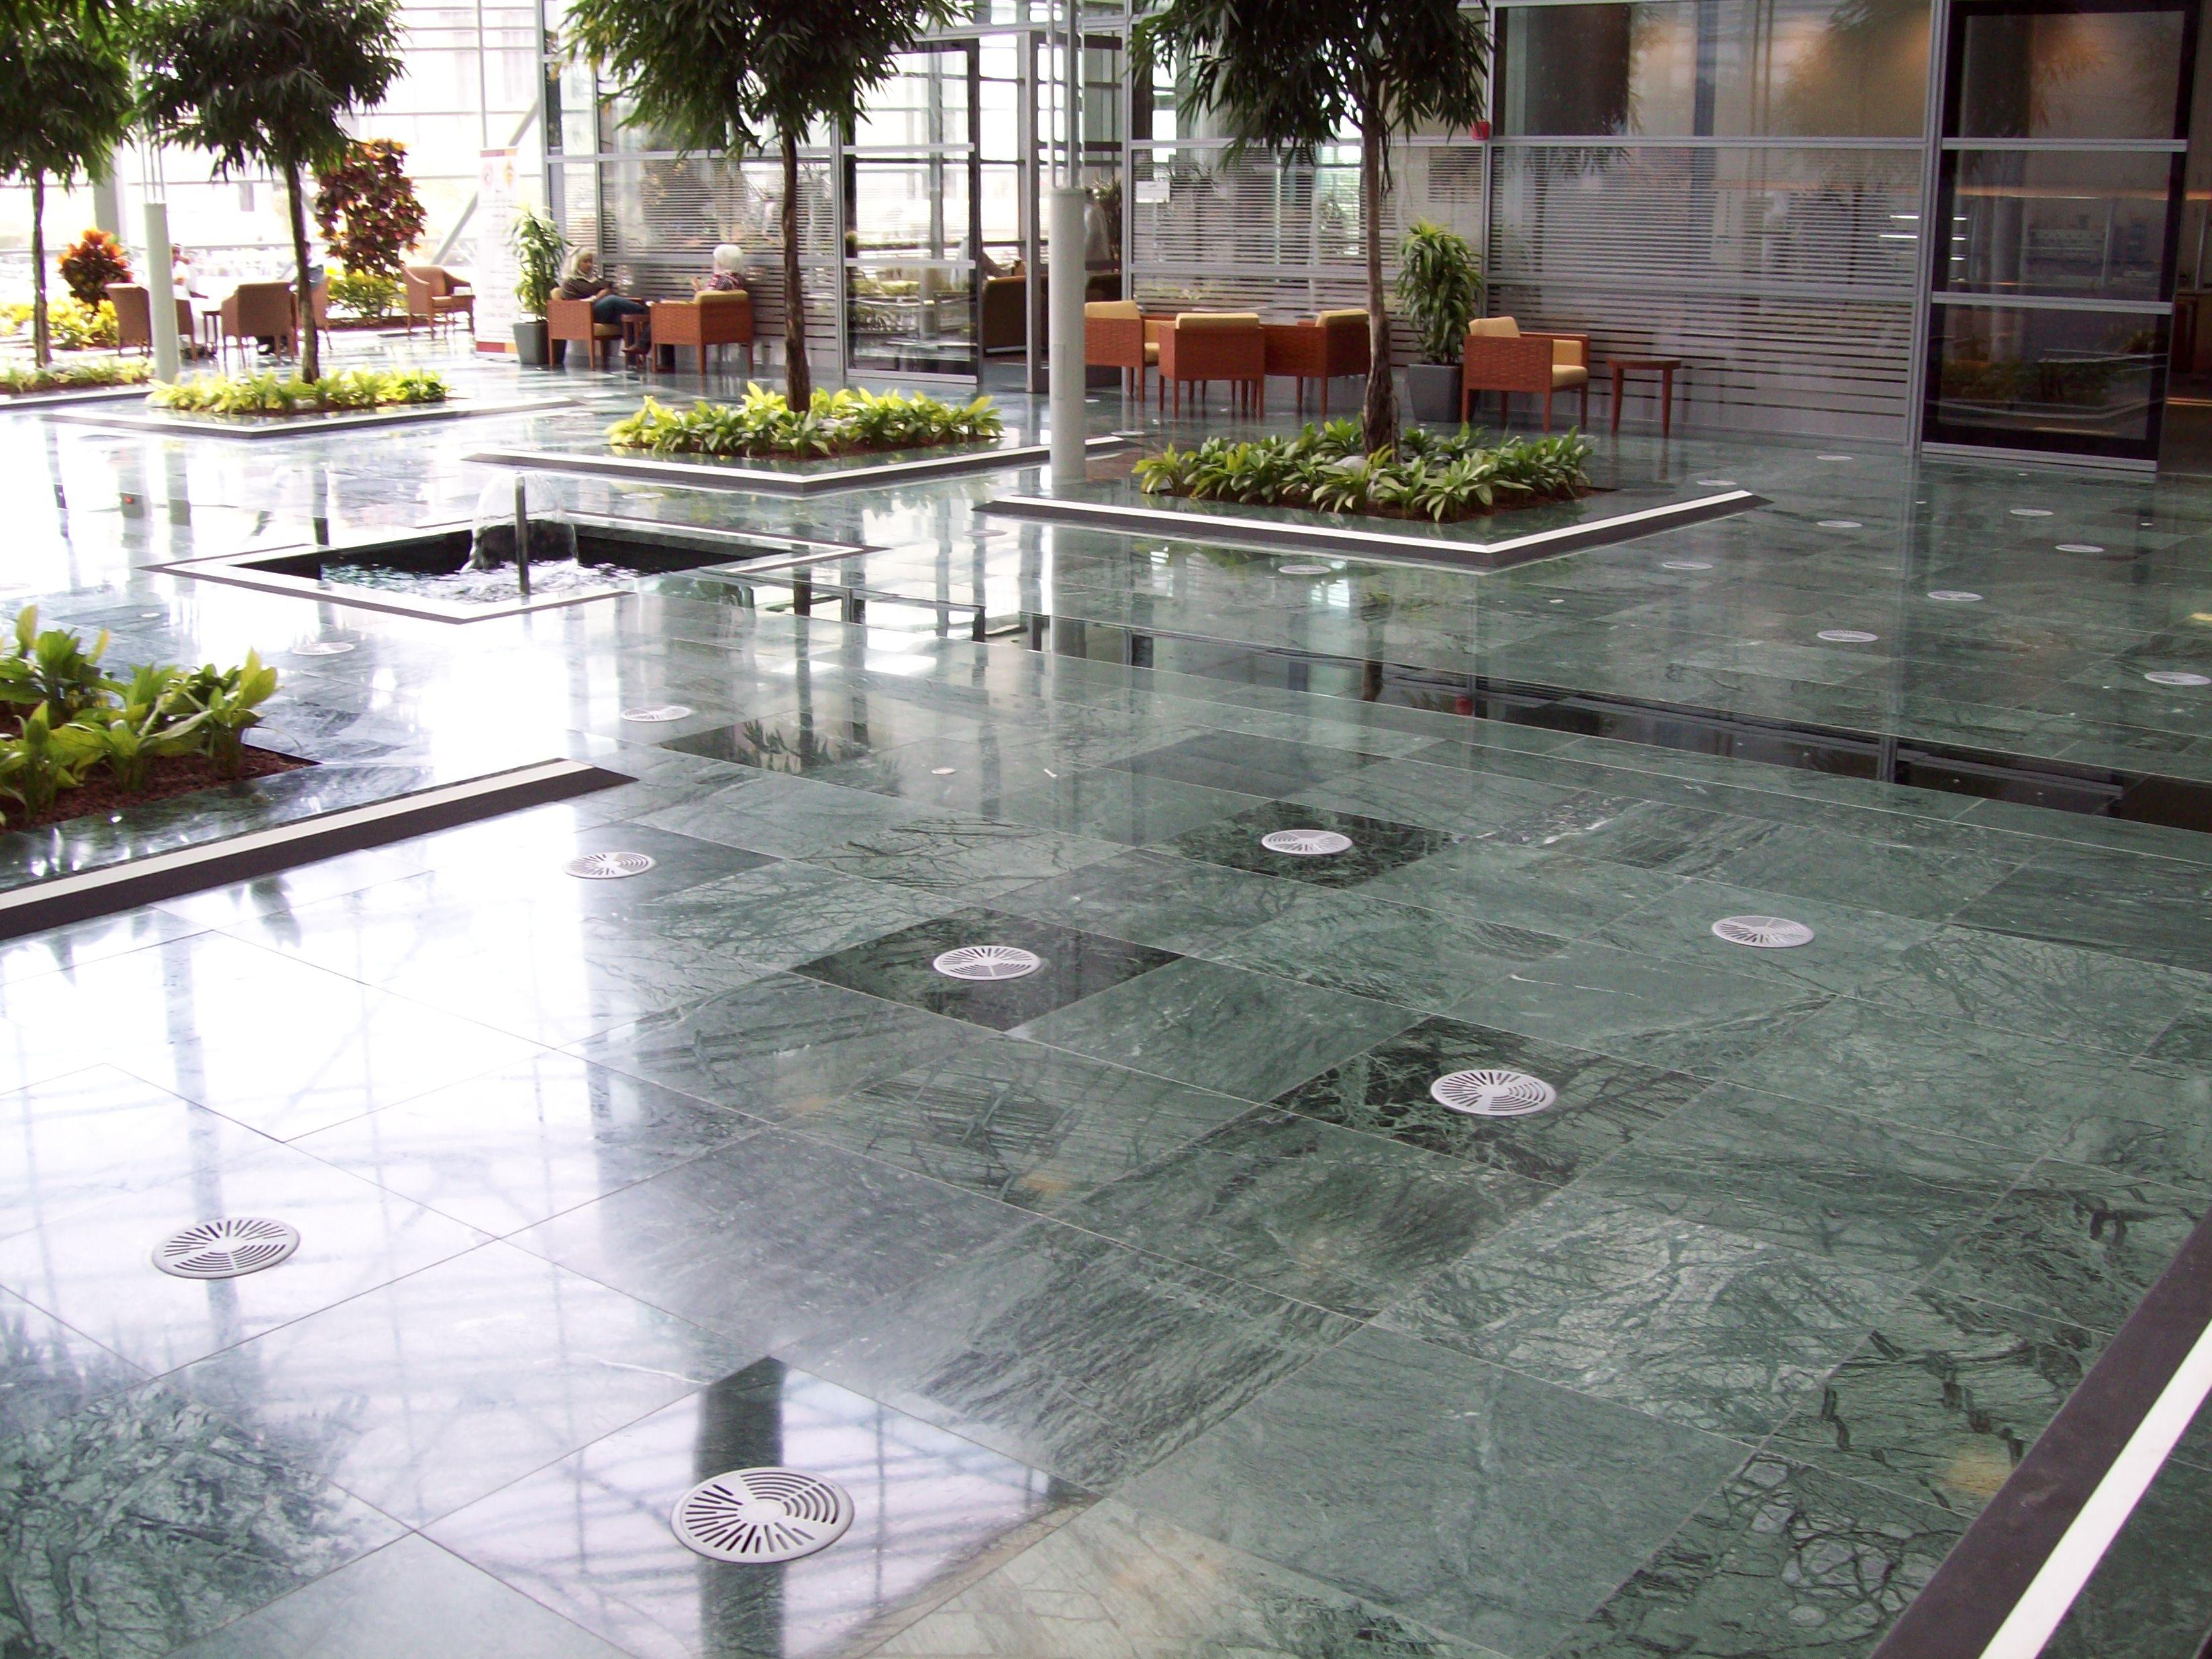 SAB MARMO 0131 State Audit Bureau: pavimenti sopraelevati Nesite anche in Kuwait